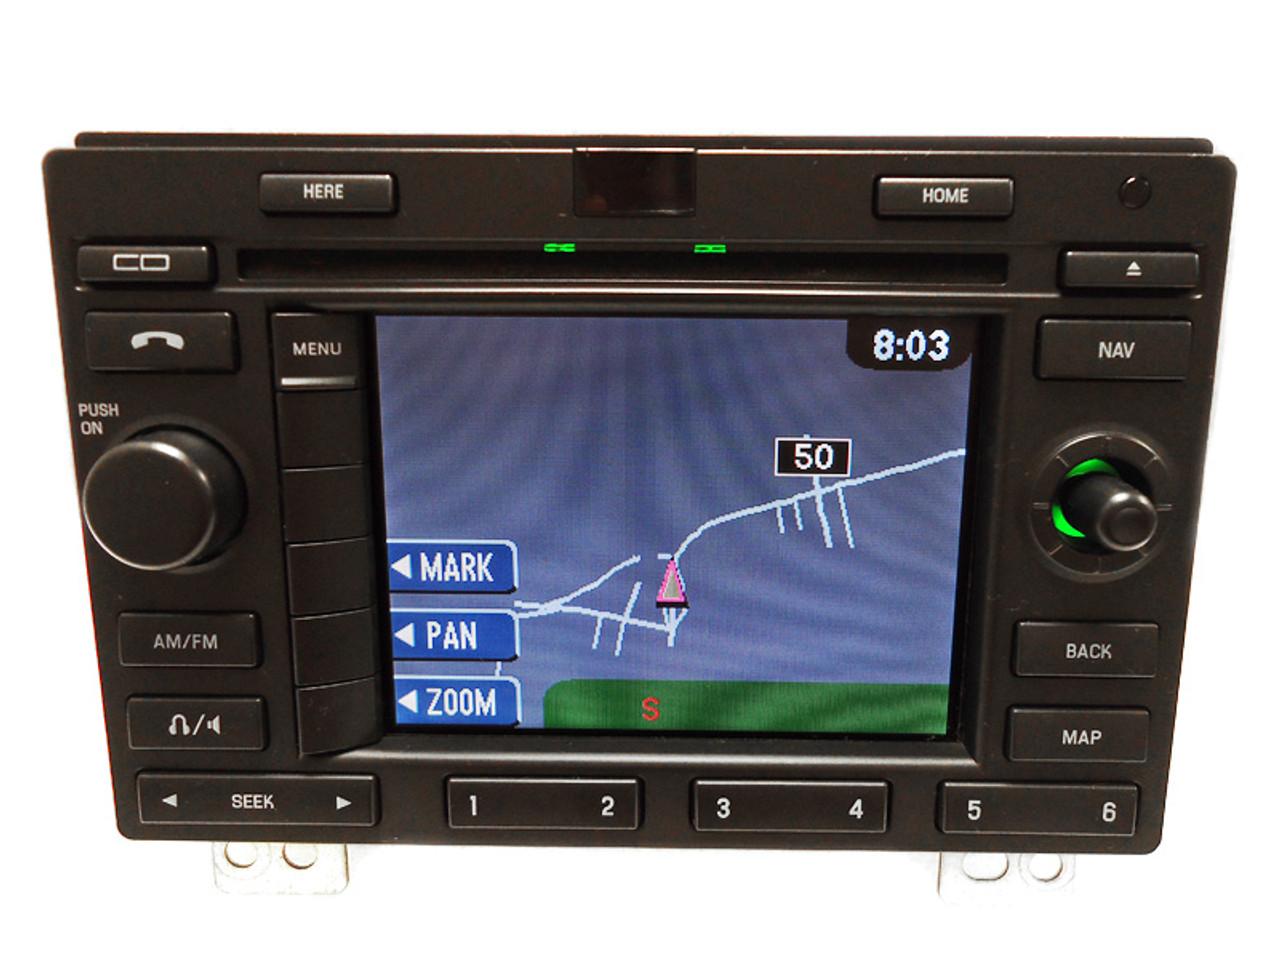 Ford Expedition Navigation Gps Radio Stereo Cd Player Lcd Display Rhcd4car: 2003 Ford Expedition Navigation Radio At Gmaili.net